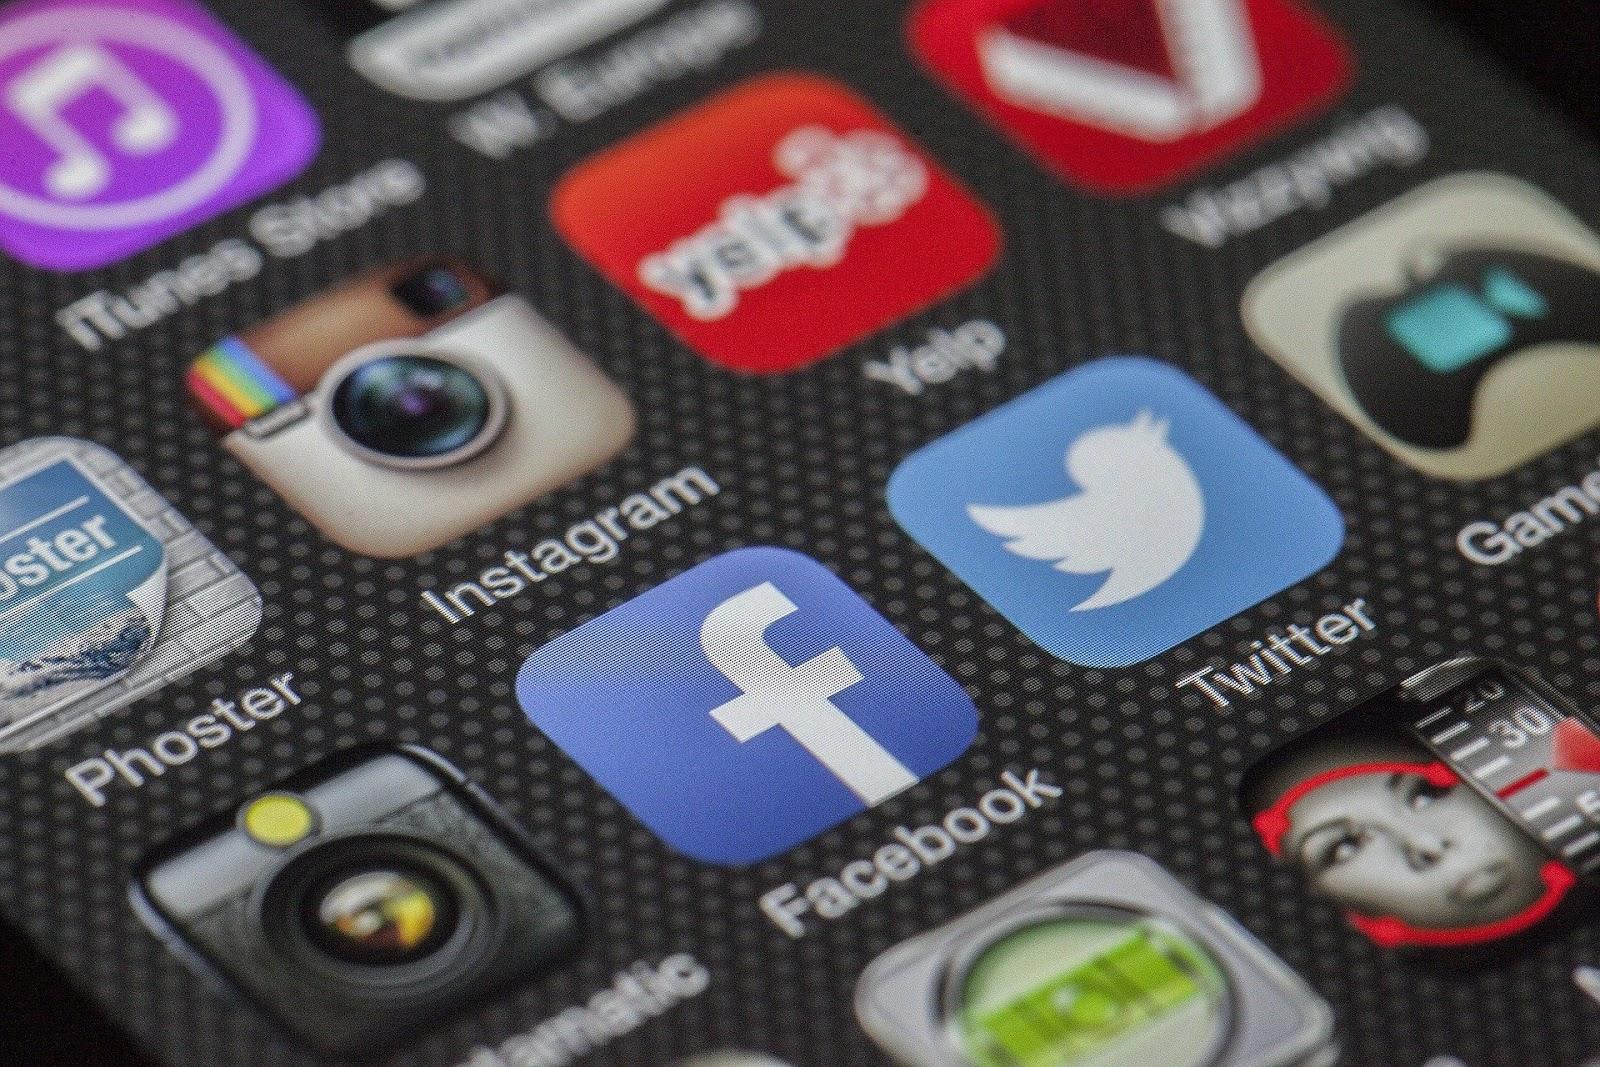 Instagram, Facebook & Twitter Social Media Icons on Phone